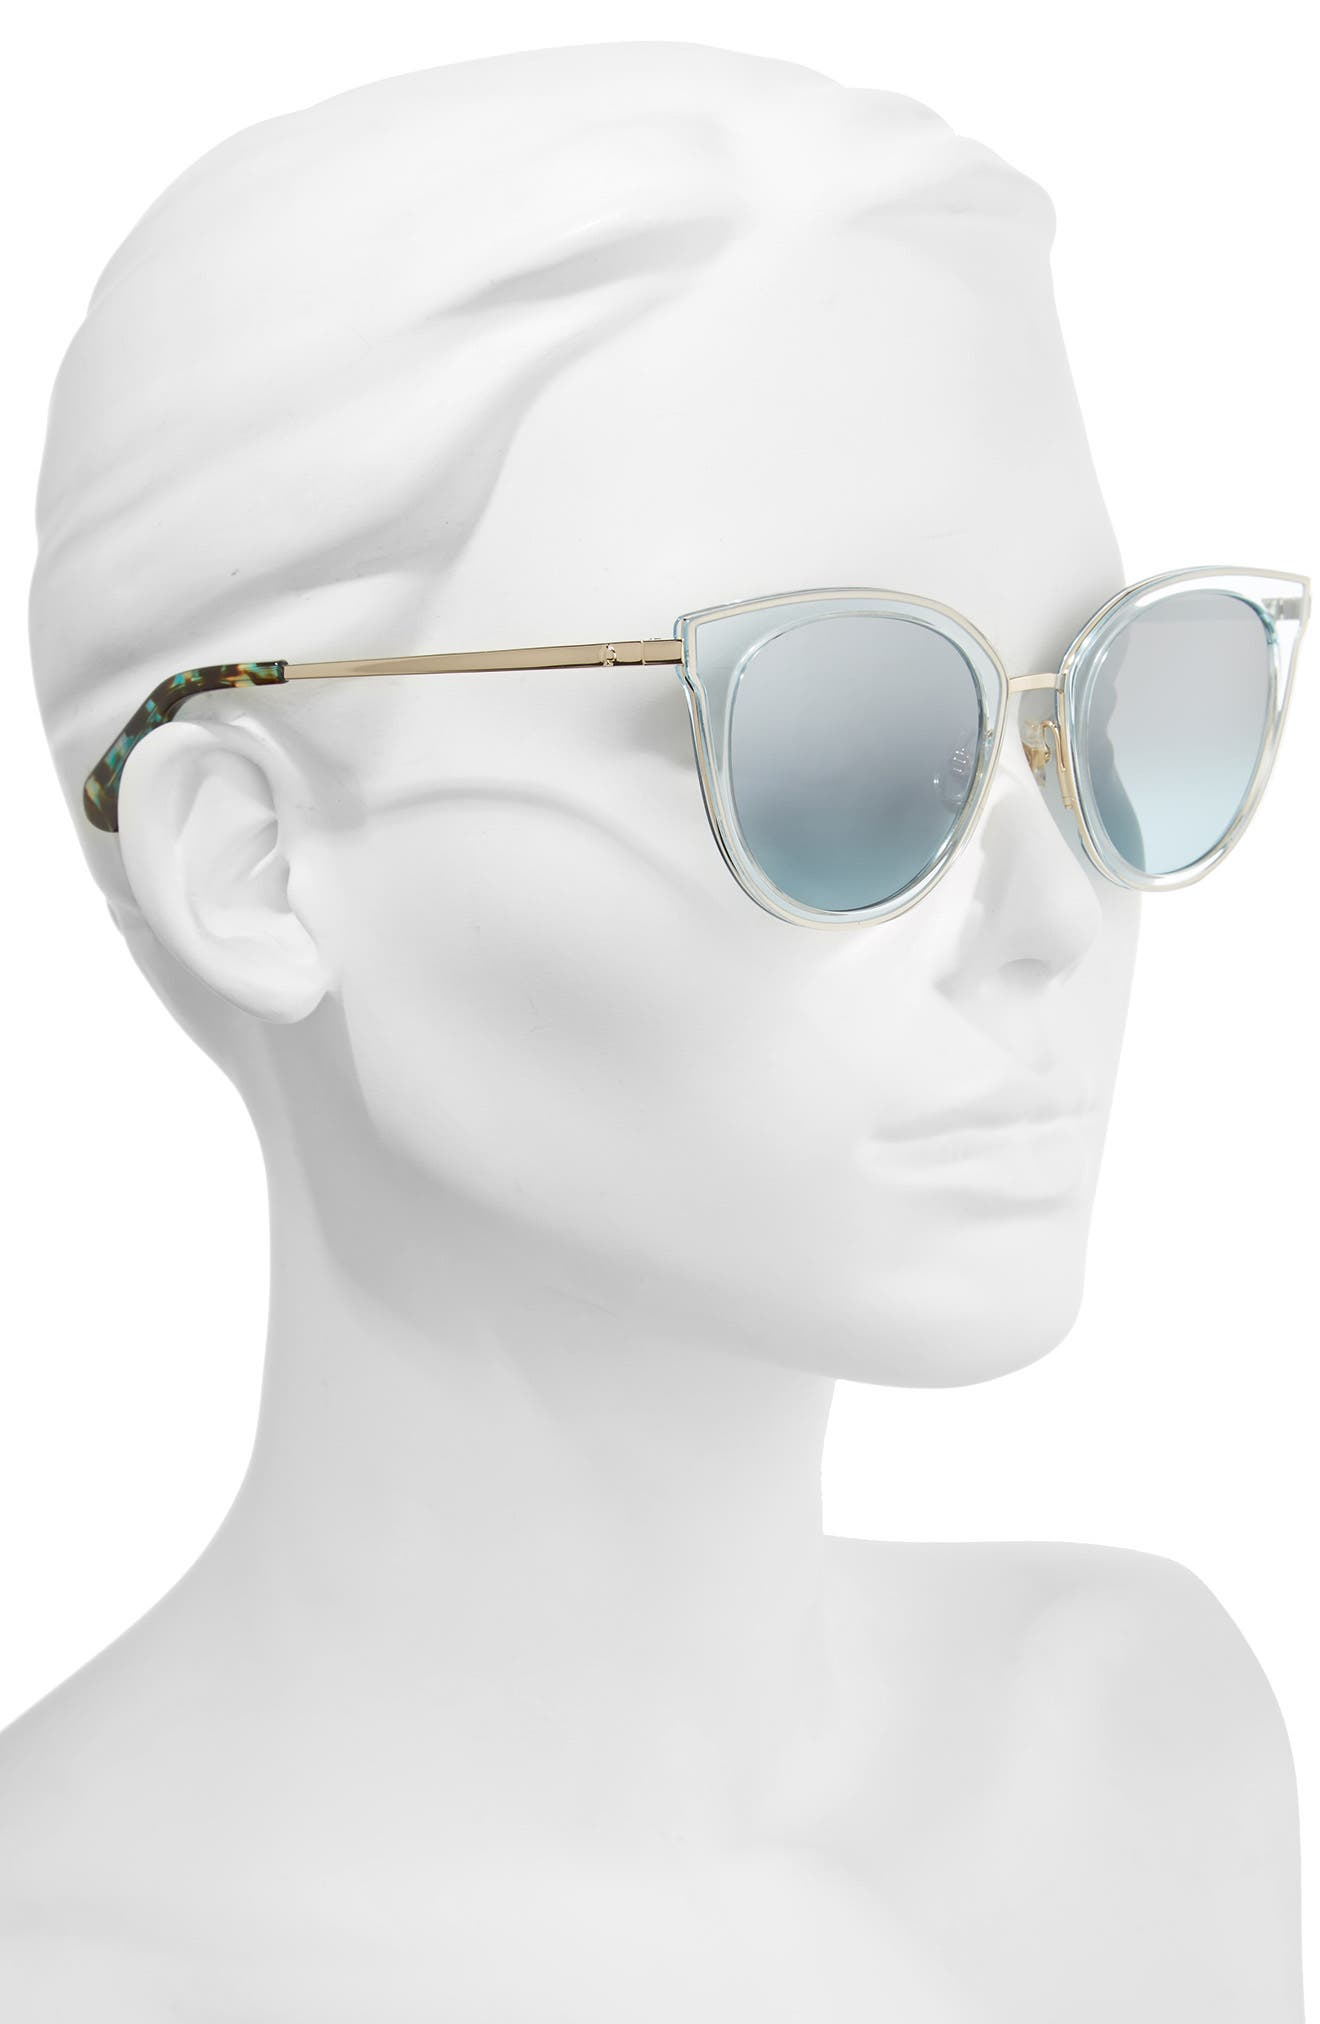 jazzlyn 51mm Cat Eye Sunglasses,                             Alternate thumbnail 2, color,                             Blue/ Gold